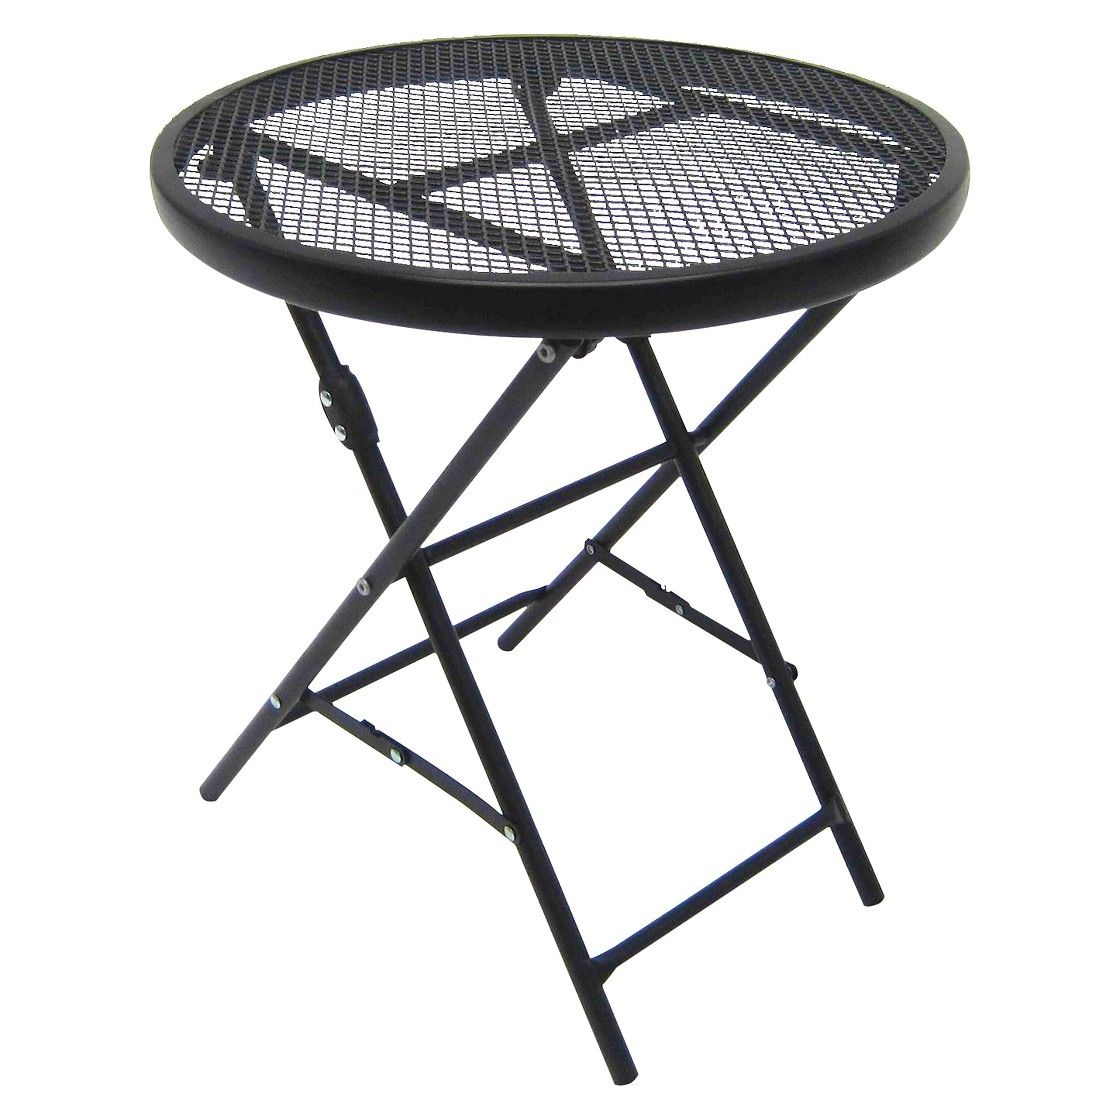 18 steel mesh patio folding table